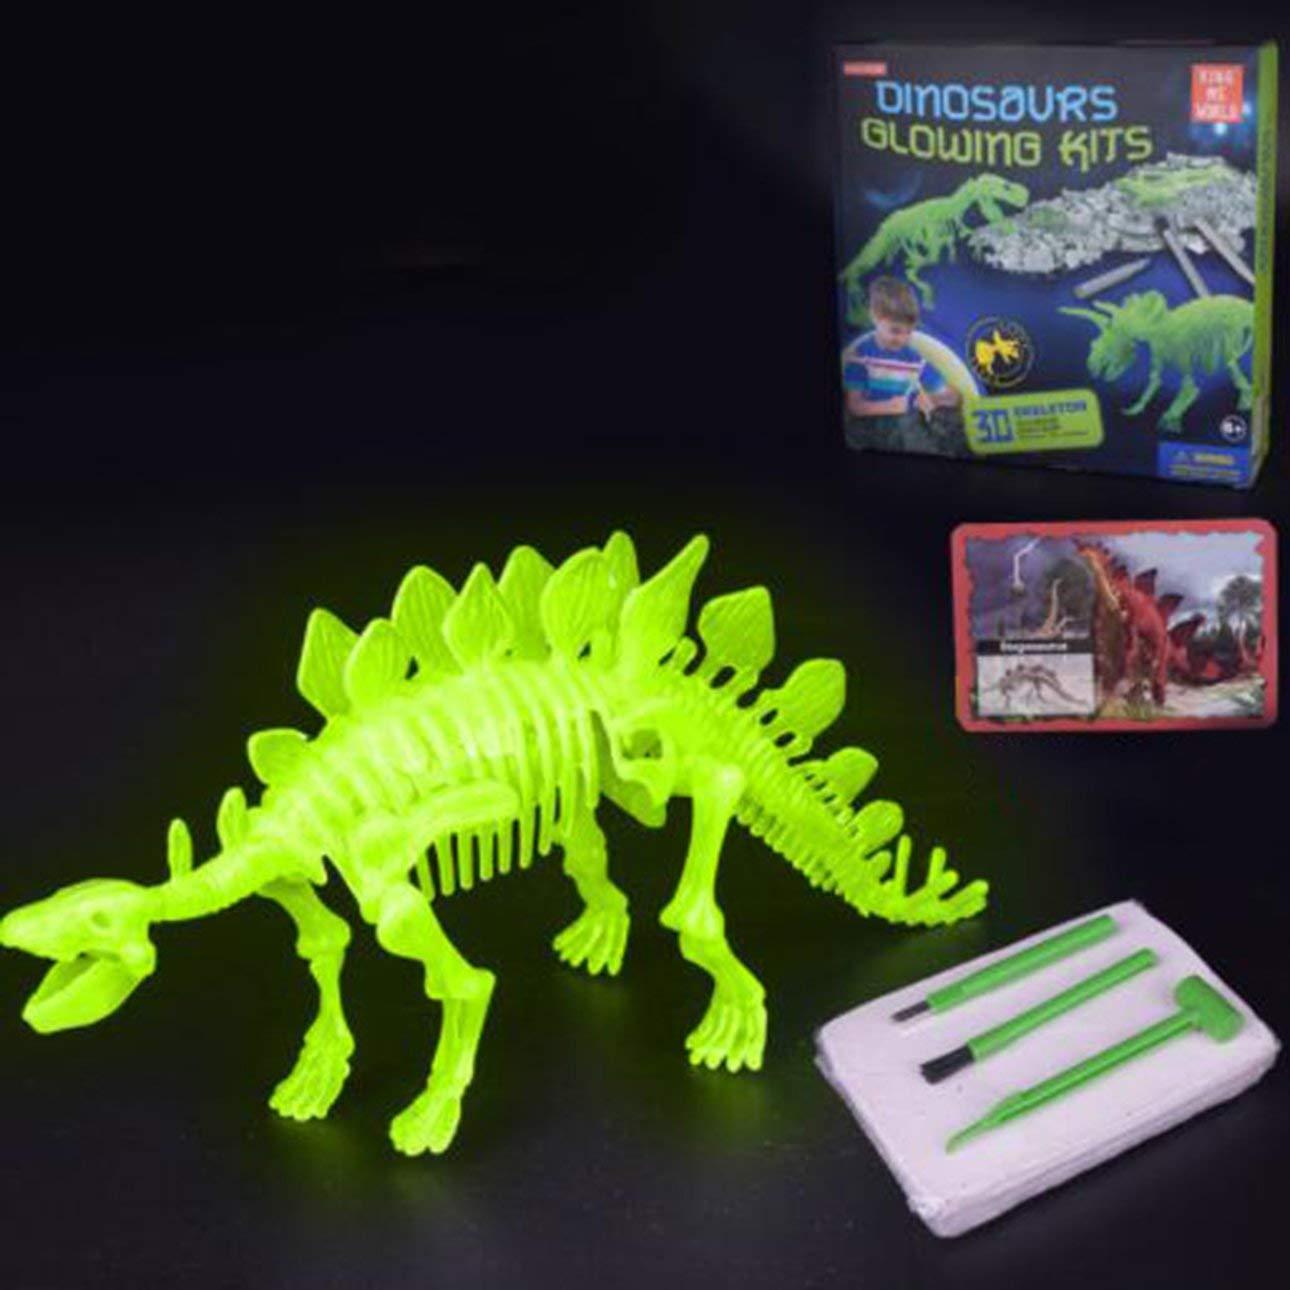 Ballylelly Dinosaurios excavan Esqueleto ensamblan Juguetes DIY Inteligencia noctilucentes